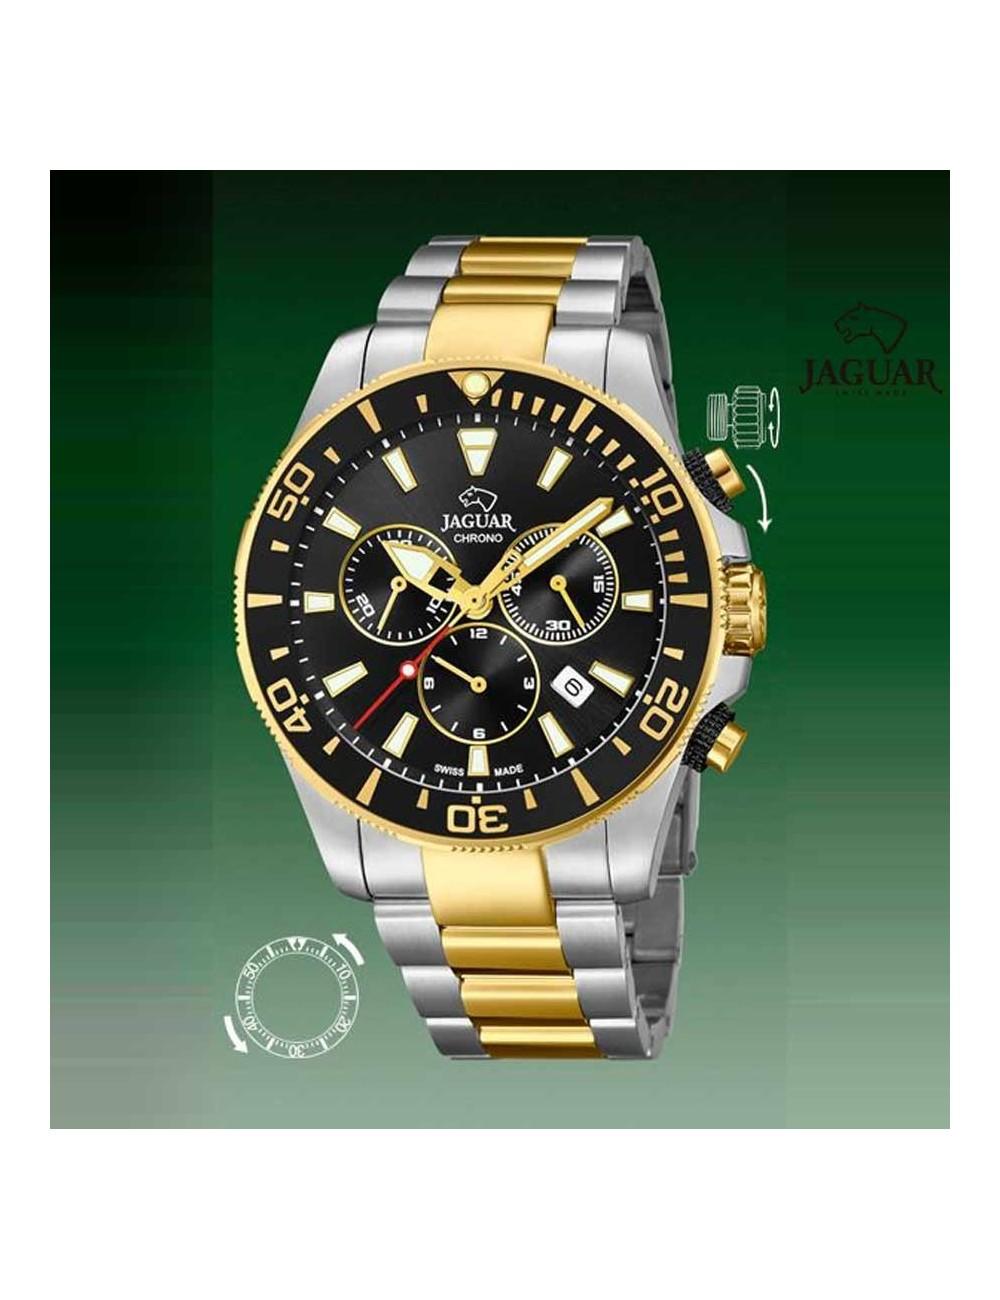 858903c7e33c Reloj Jaguar hombre diver negro bicolor cronografo bisel J862-2